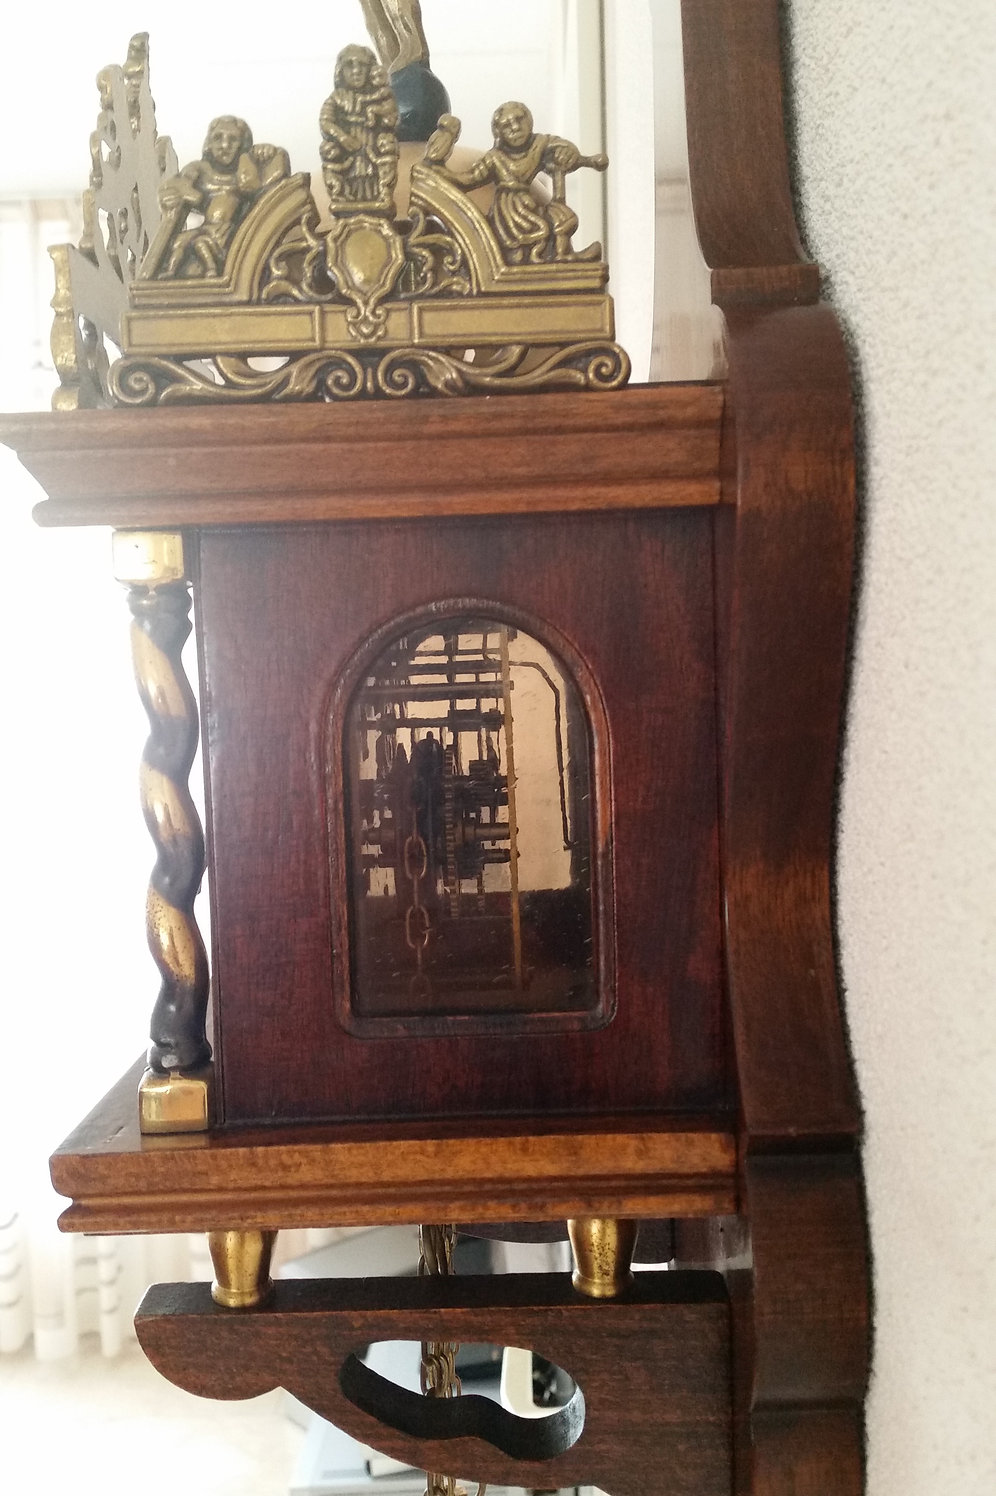 Original Wuba Quot Zaanse Wall Clock Quot Exclusive Gifts